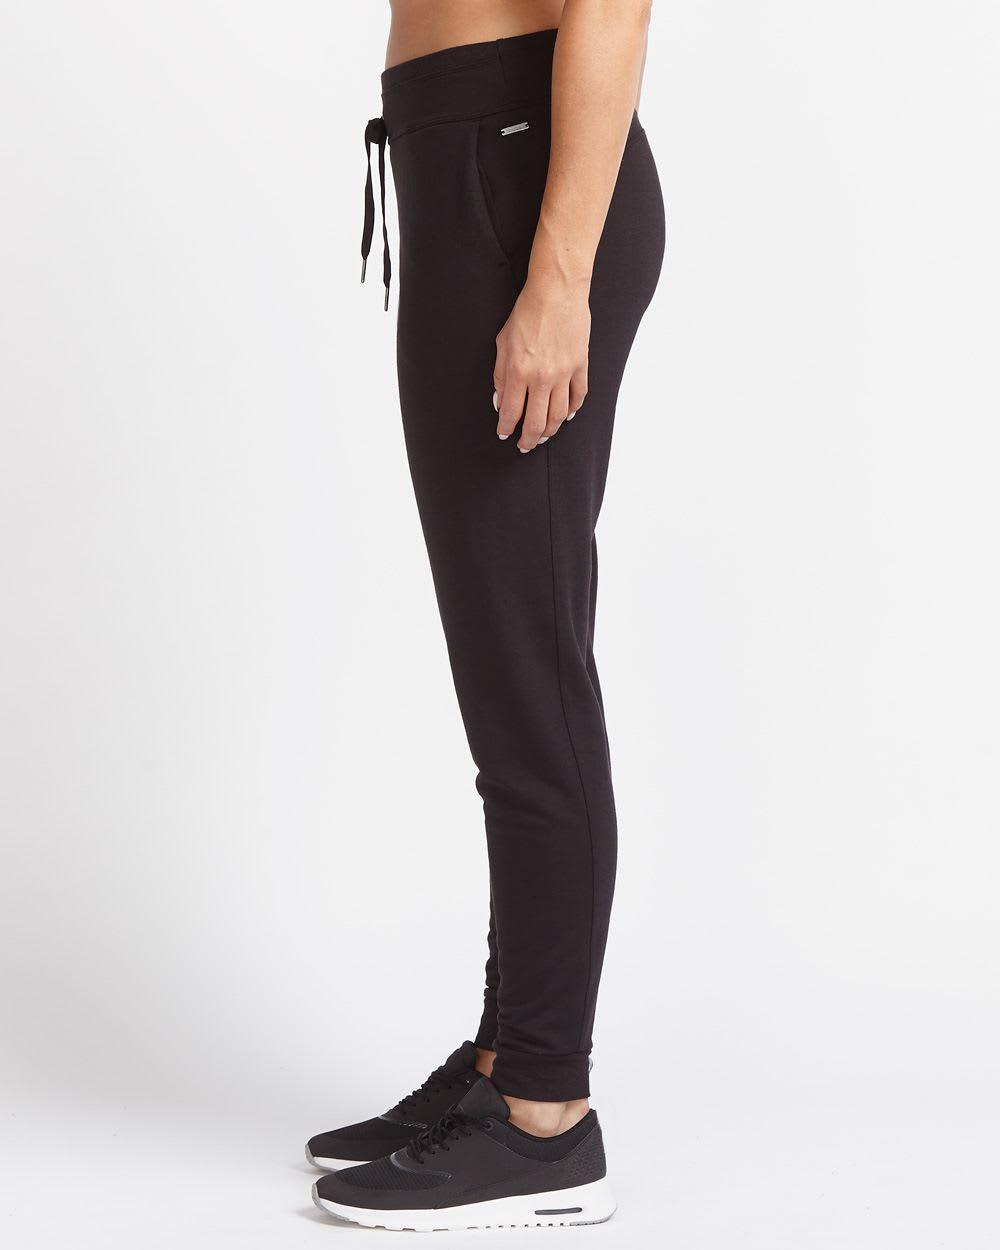 pantalon de sport doux hyba femmes reitmans. Black Bedroom Furniture Sets. Home Design Ideas